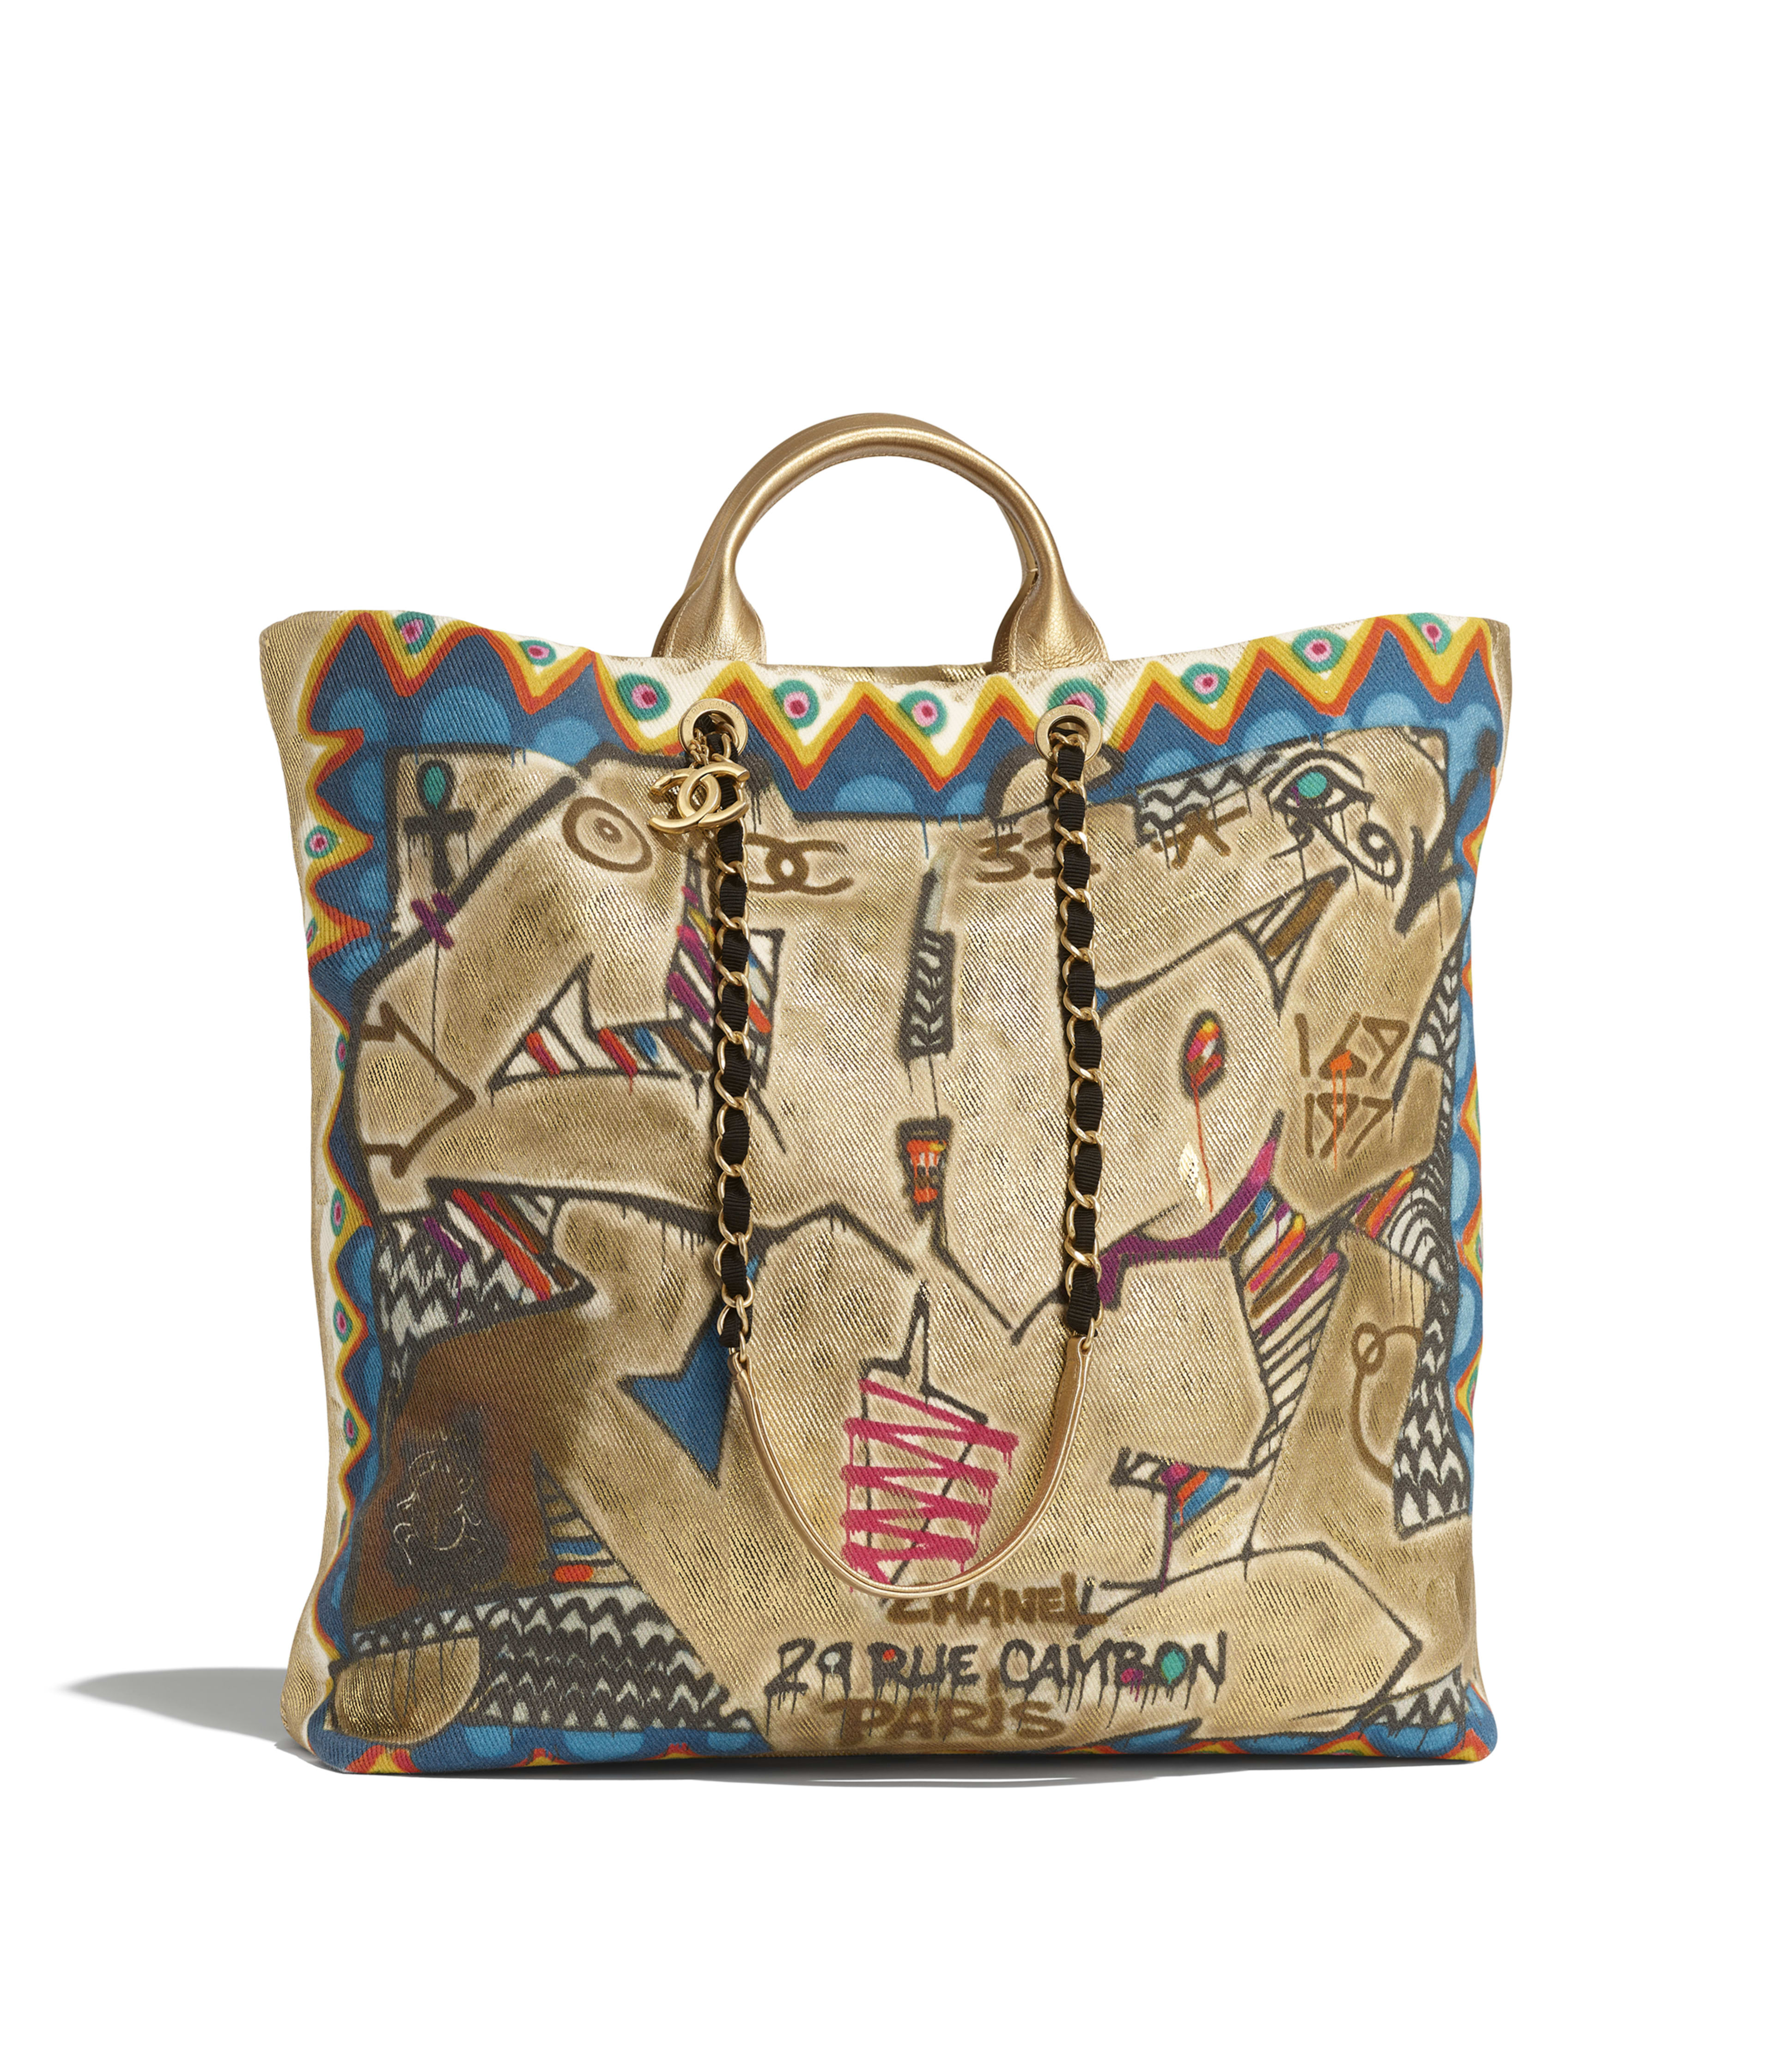 dd8bf2ccae5c9f Maxi Shopping Bag Calfskin, Cotton & Gold-Tone Metal, Multicolor Ref.  AS0850B0090099999